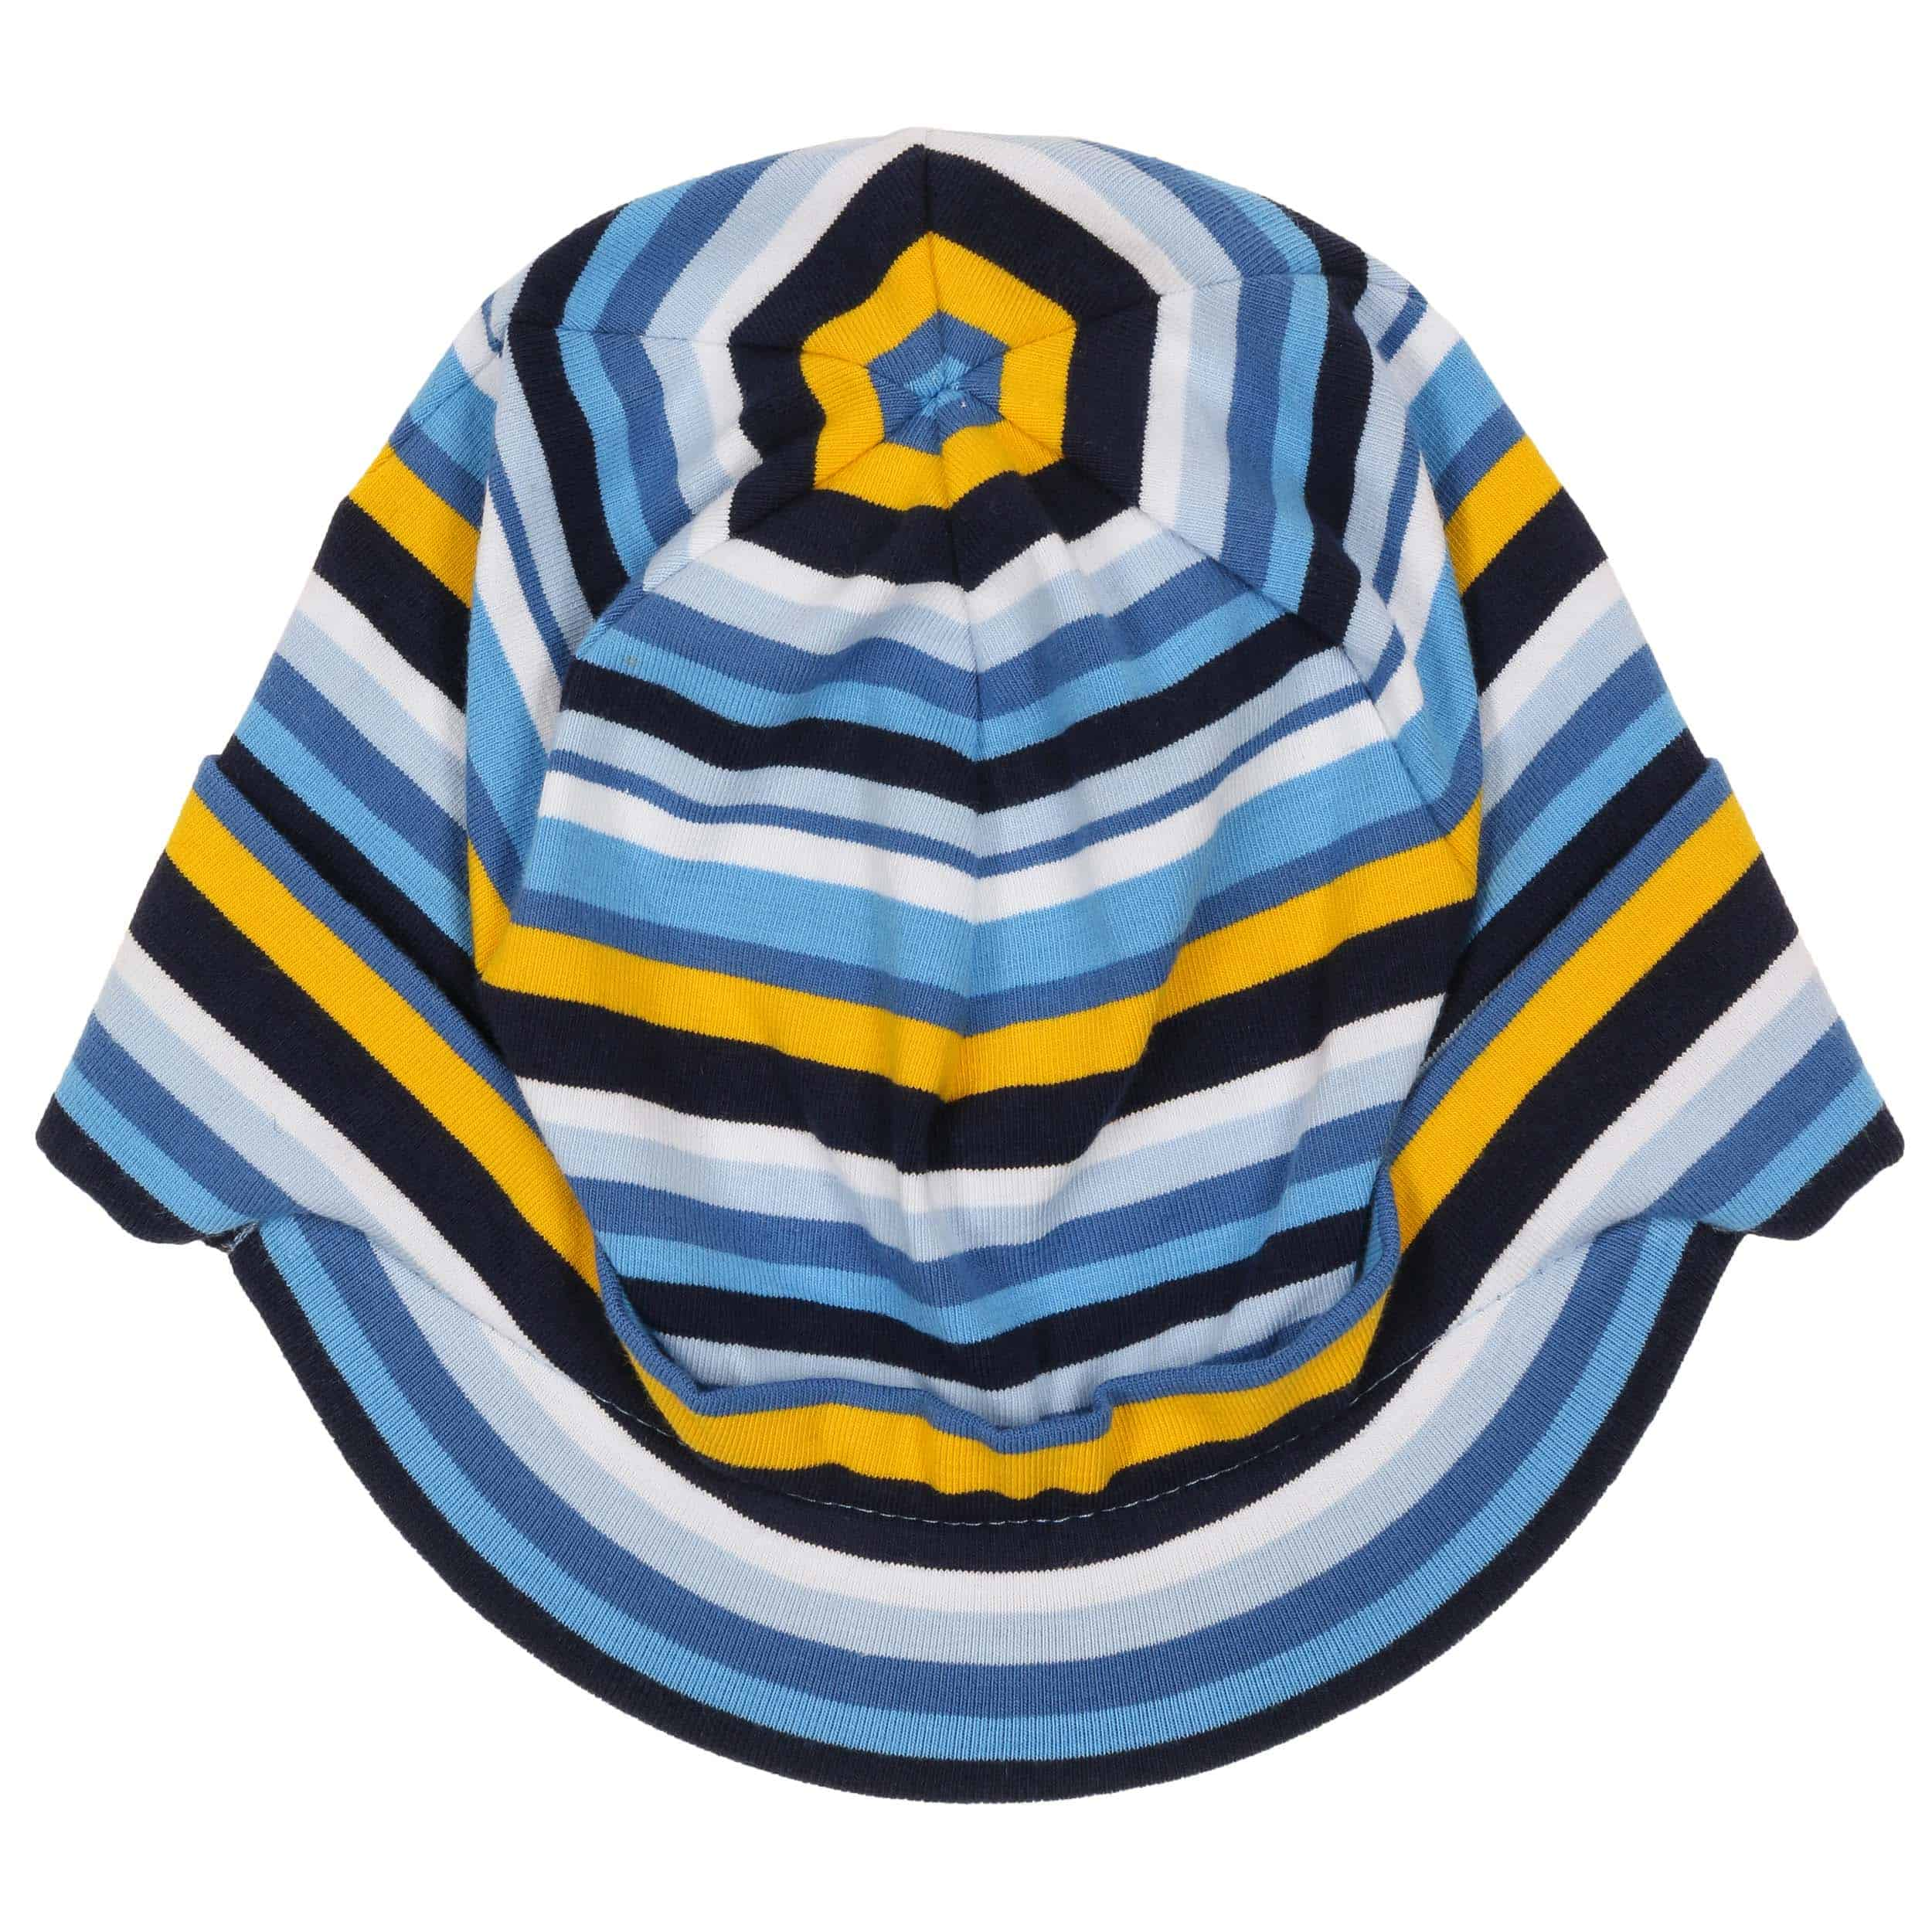 9f06c8b244e Jersey Stripes Kids Peak Hat by maximo - blue 1 ...